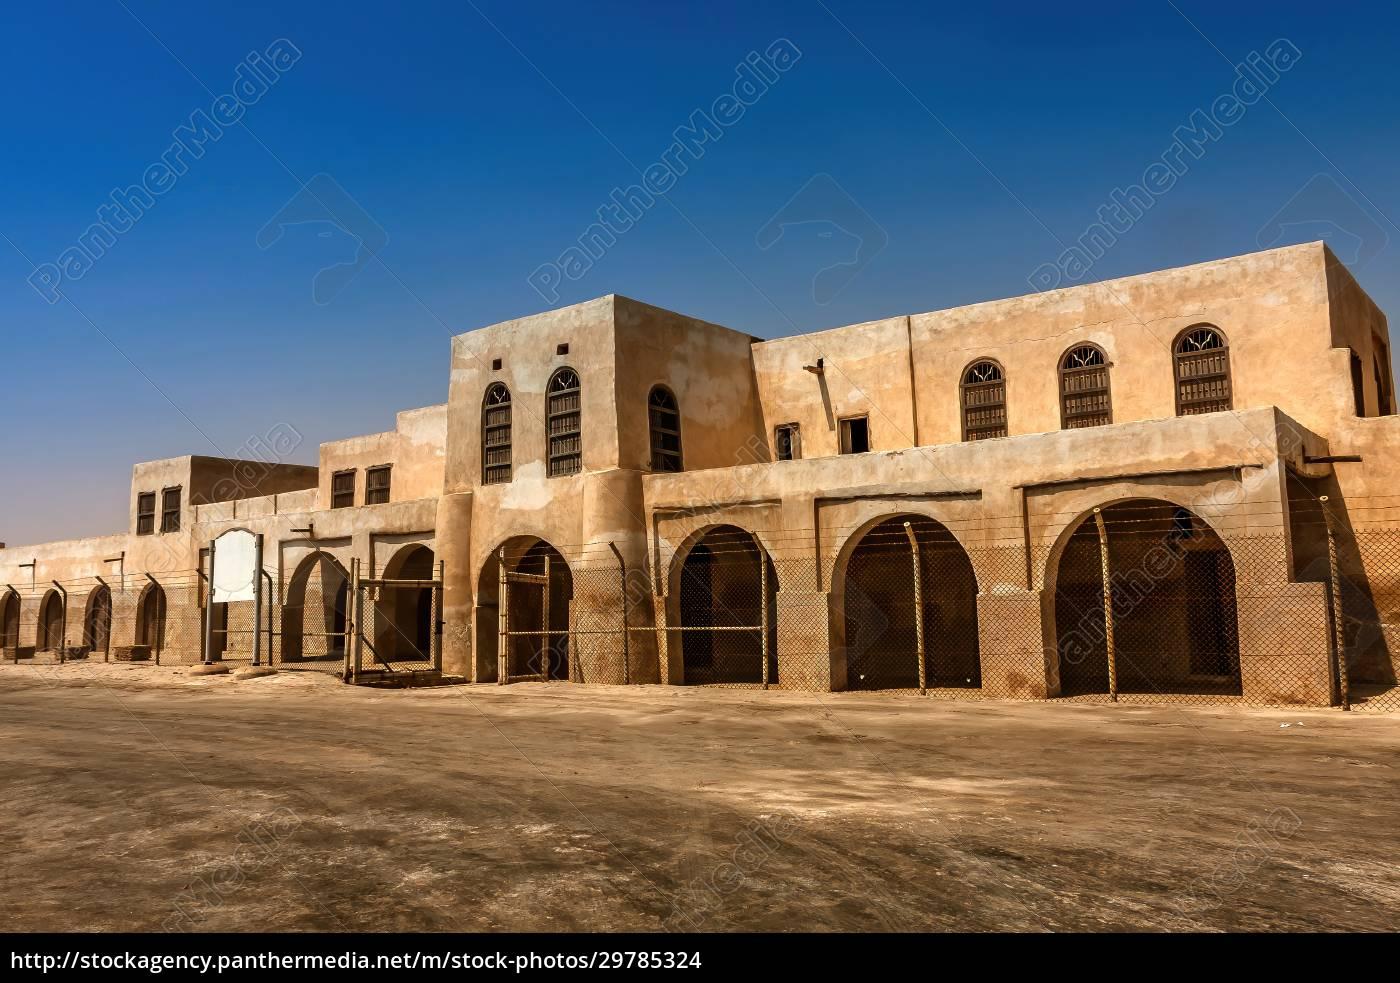 a, facade, and, entrance, to, aqeer - 29785324